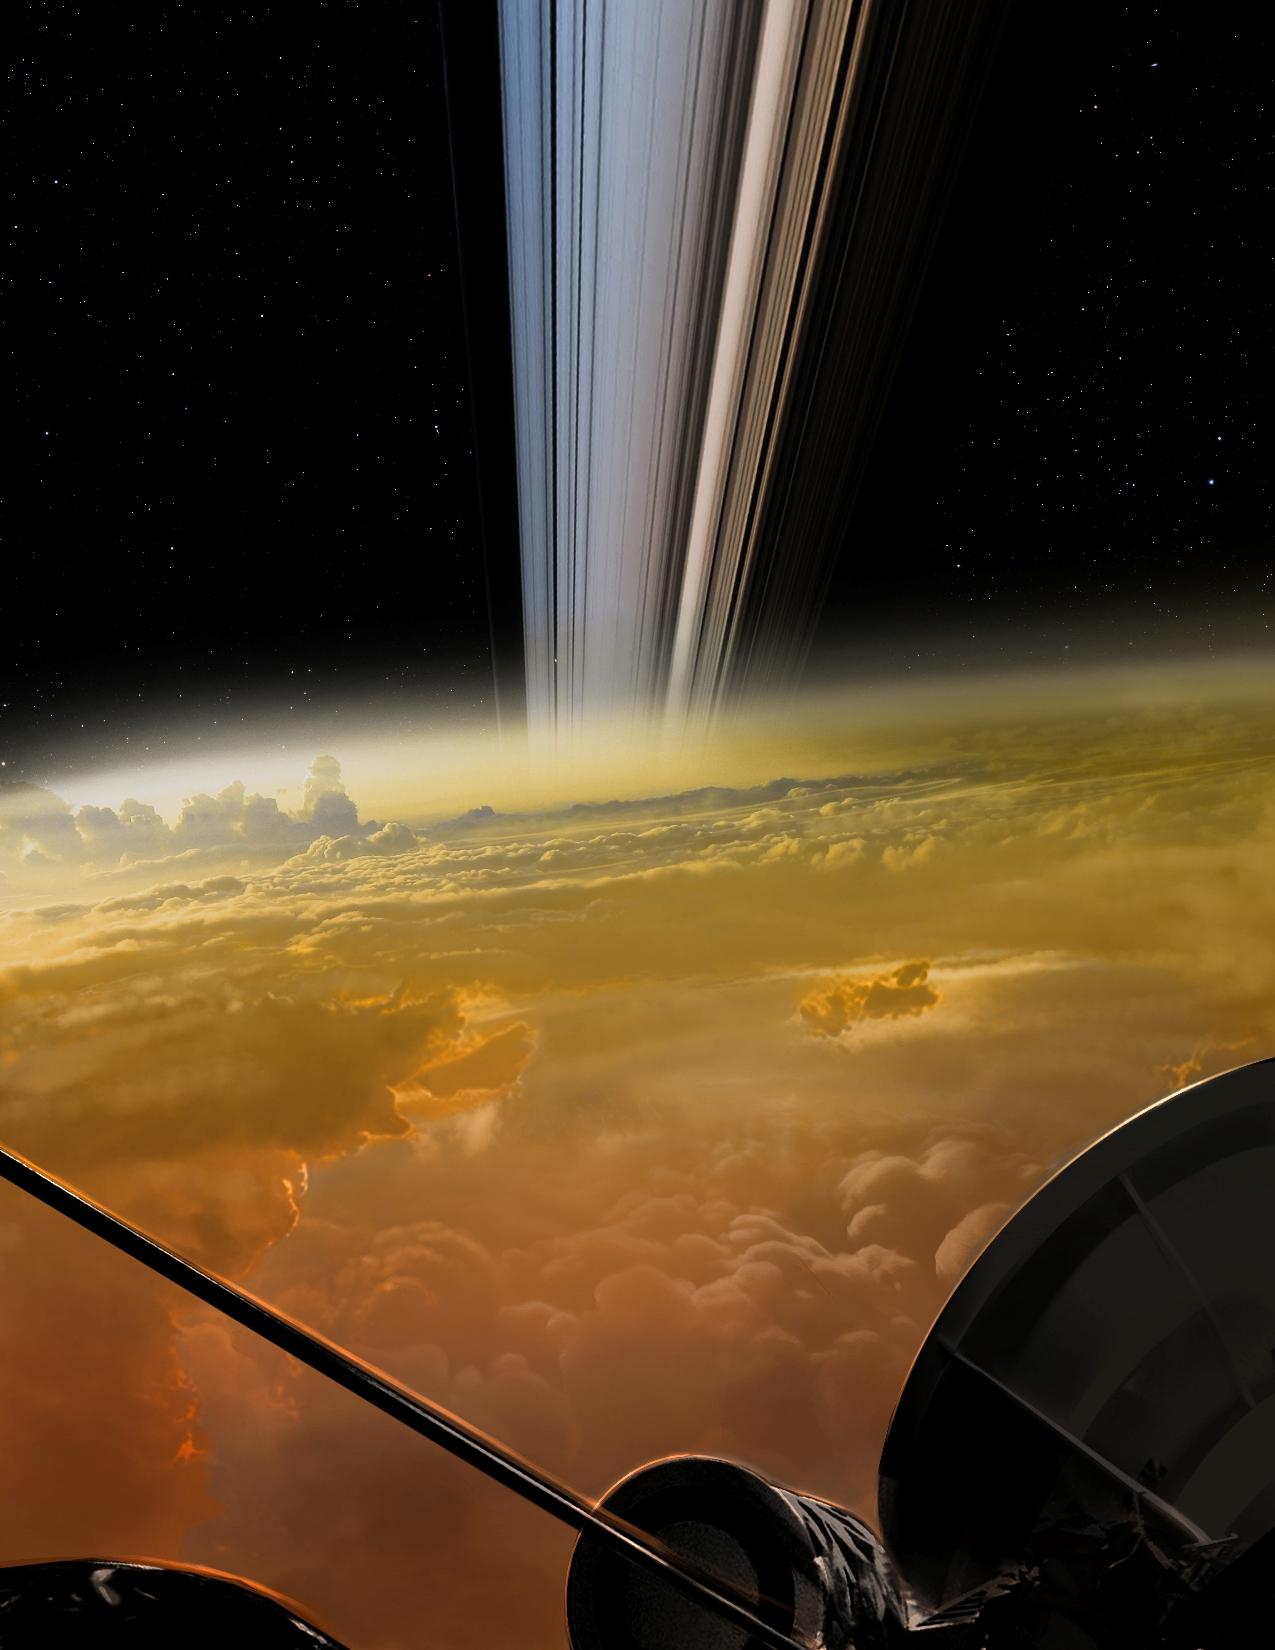 Artist's concept of Cassini crossing inside Saturn's rings